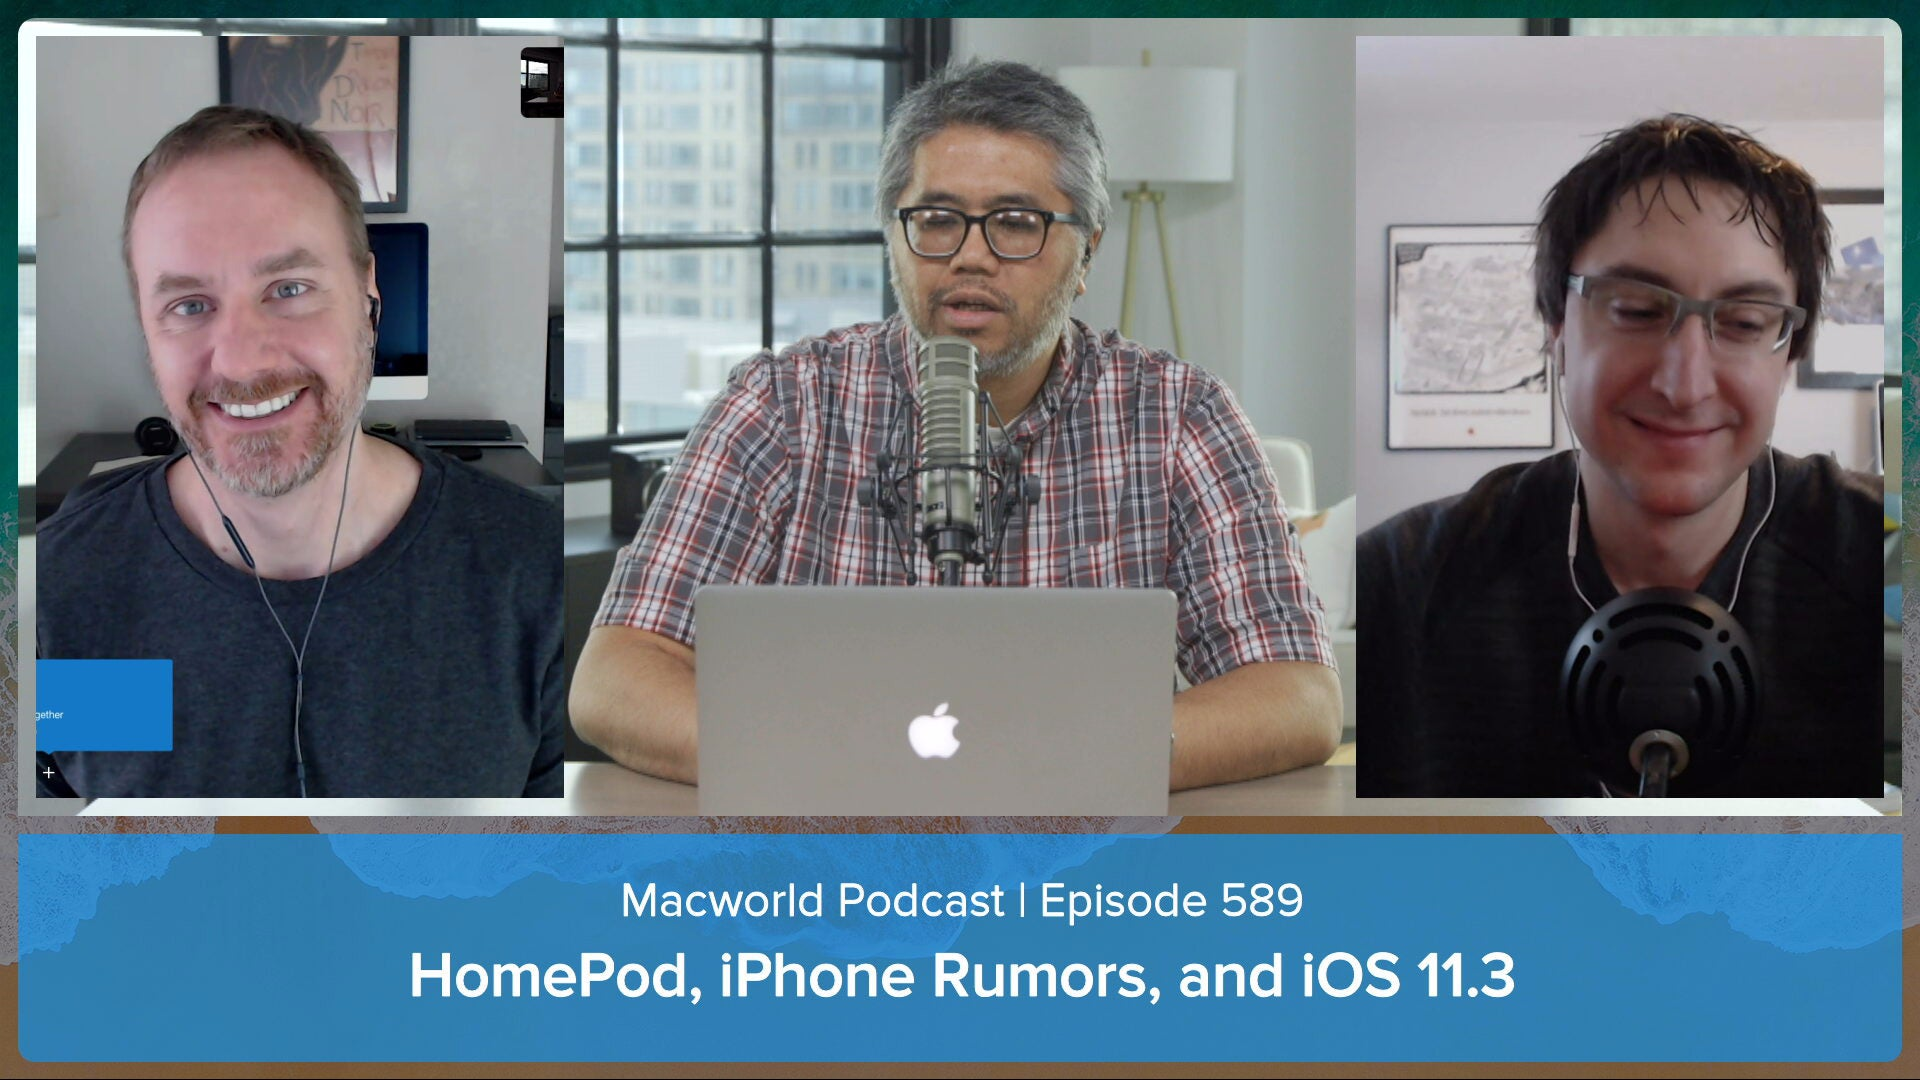 Macworld Podcast 589